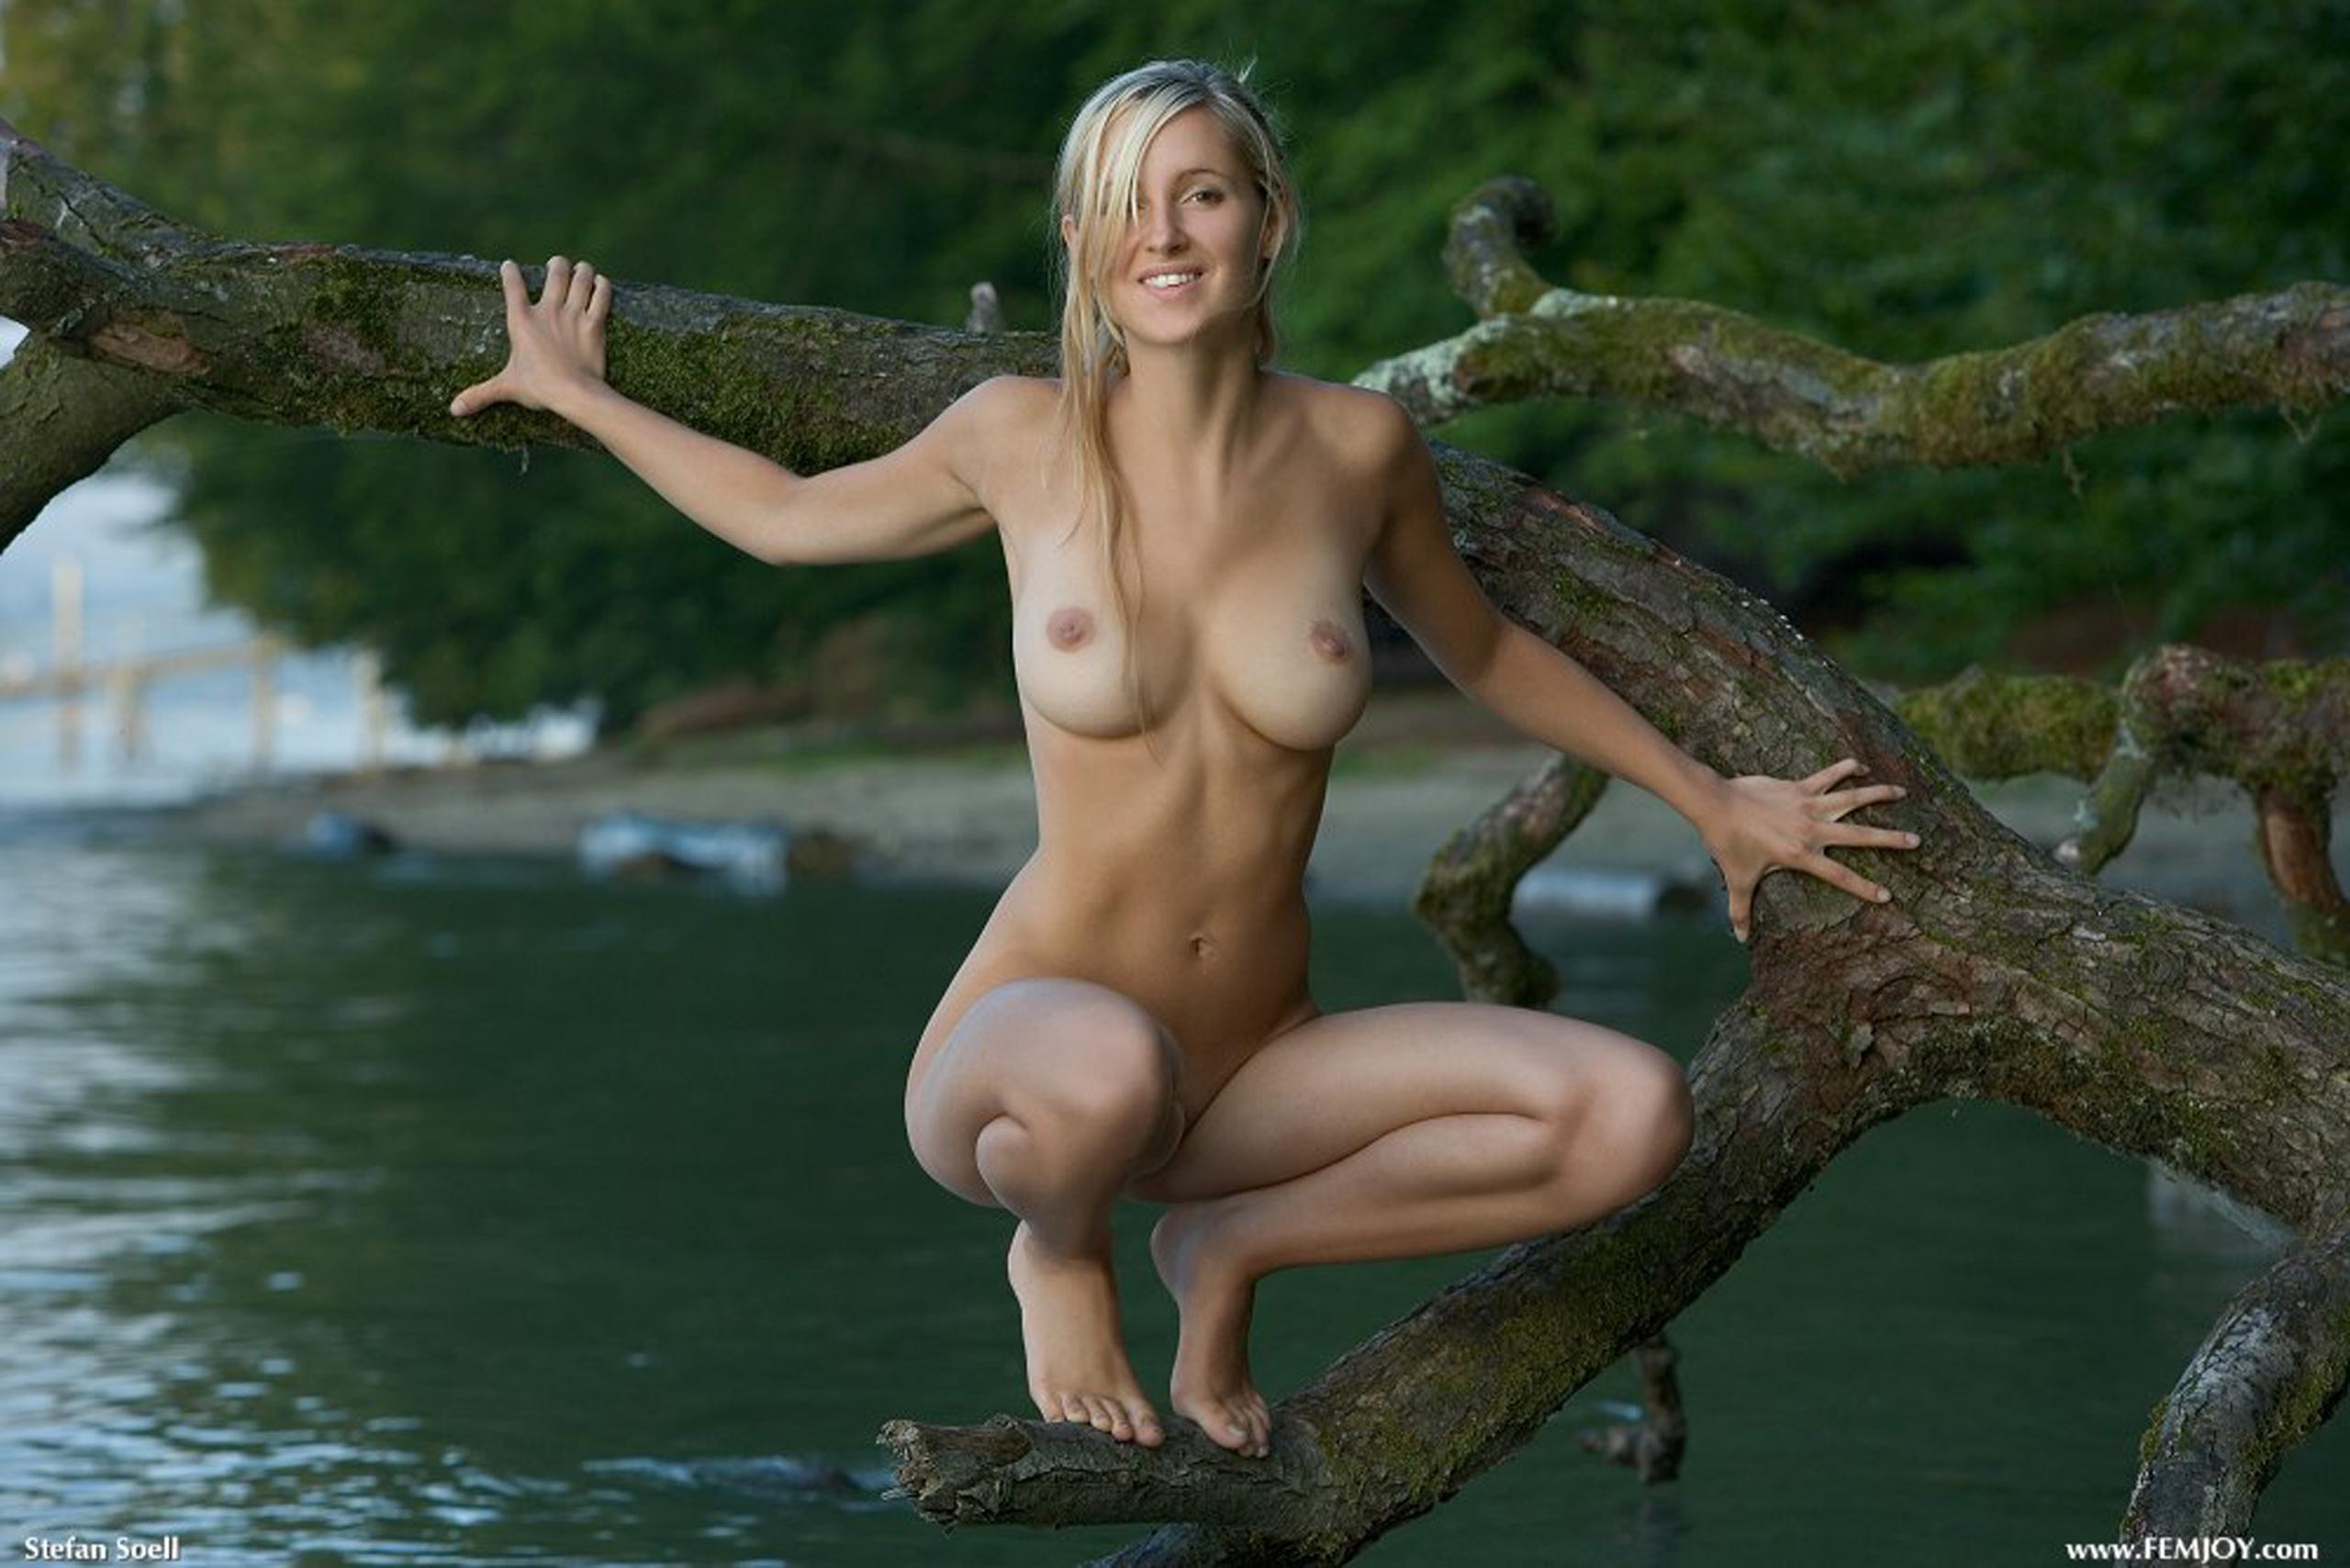 hot cutie nude in nature